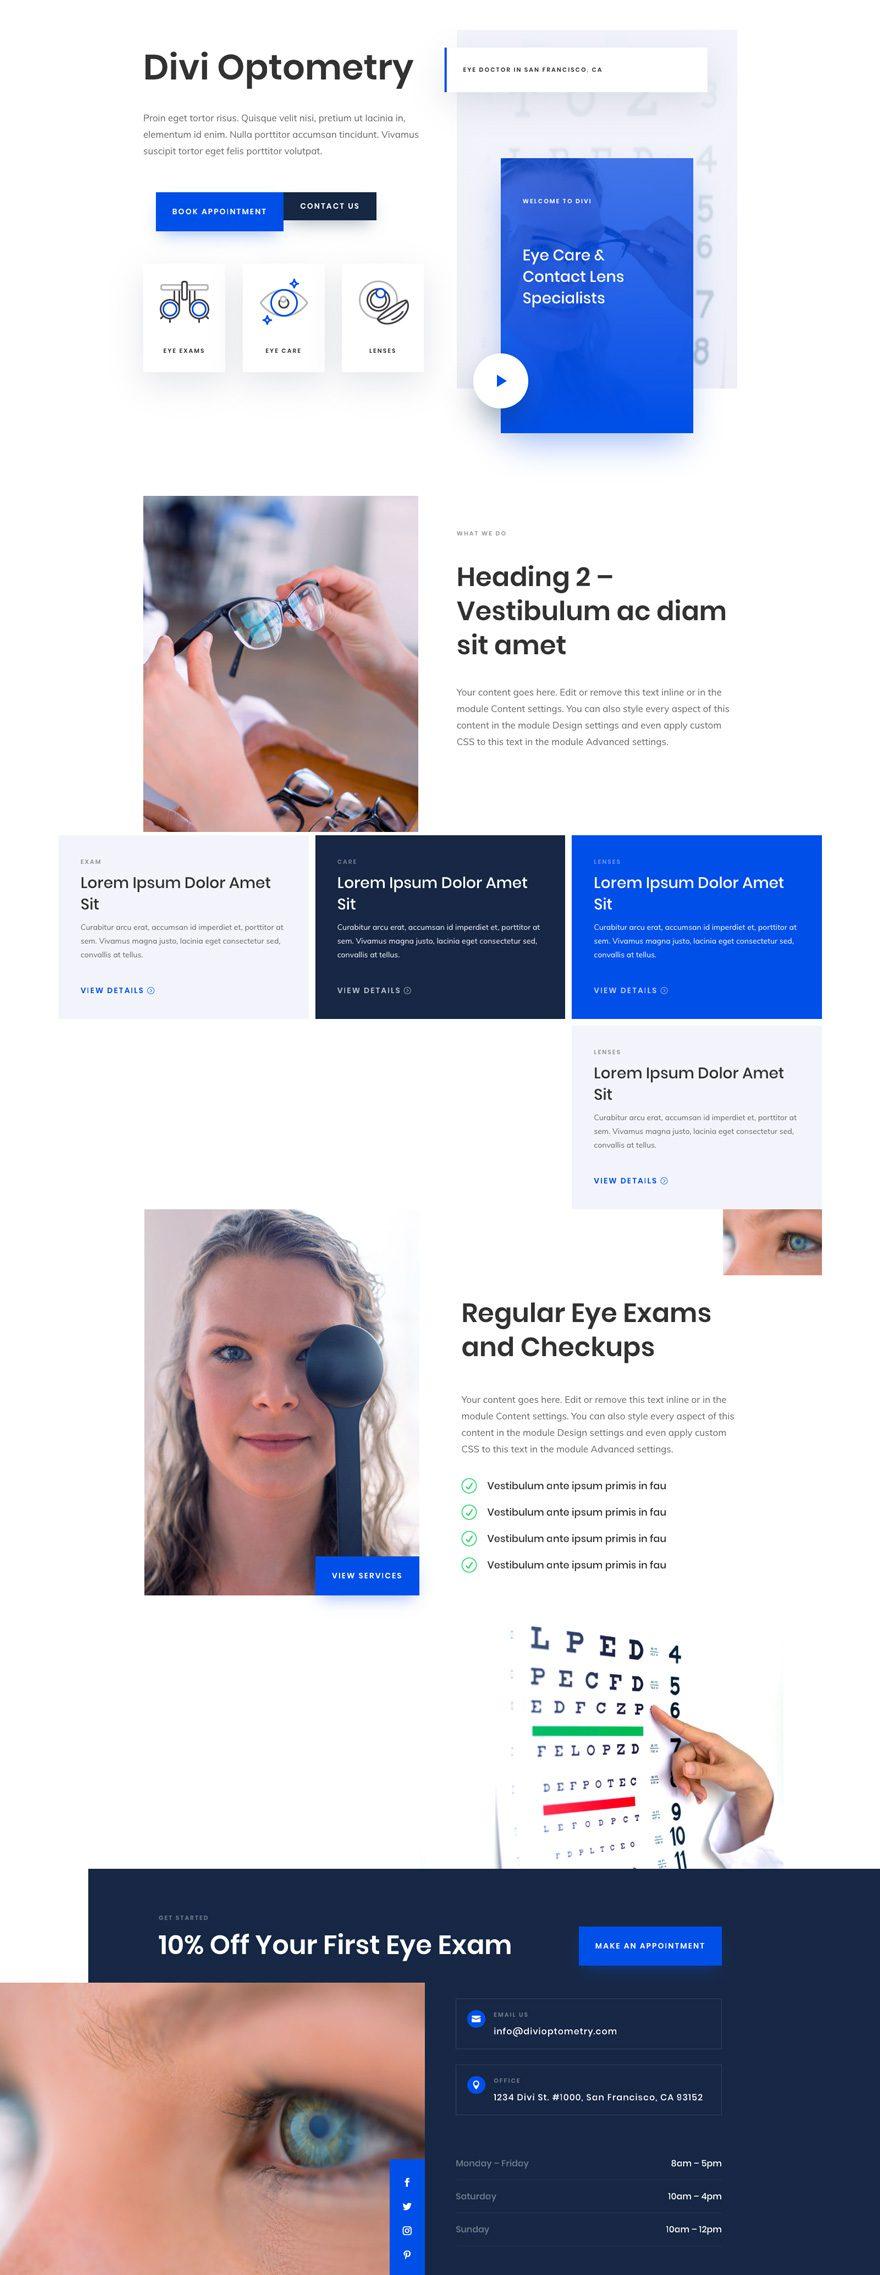 divi eye doctor layout pack